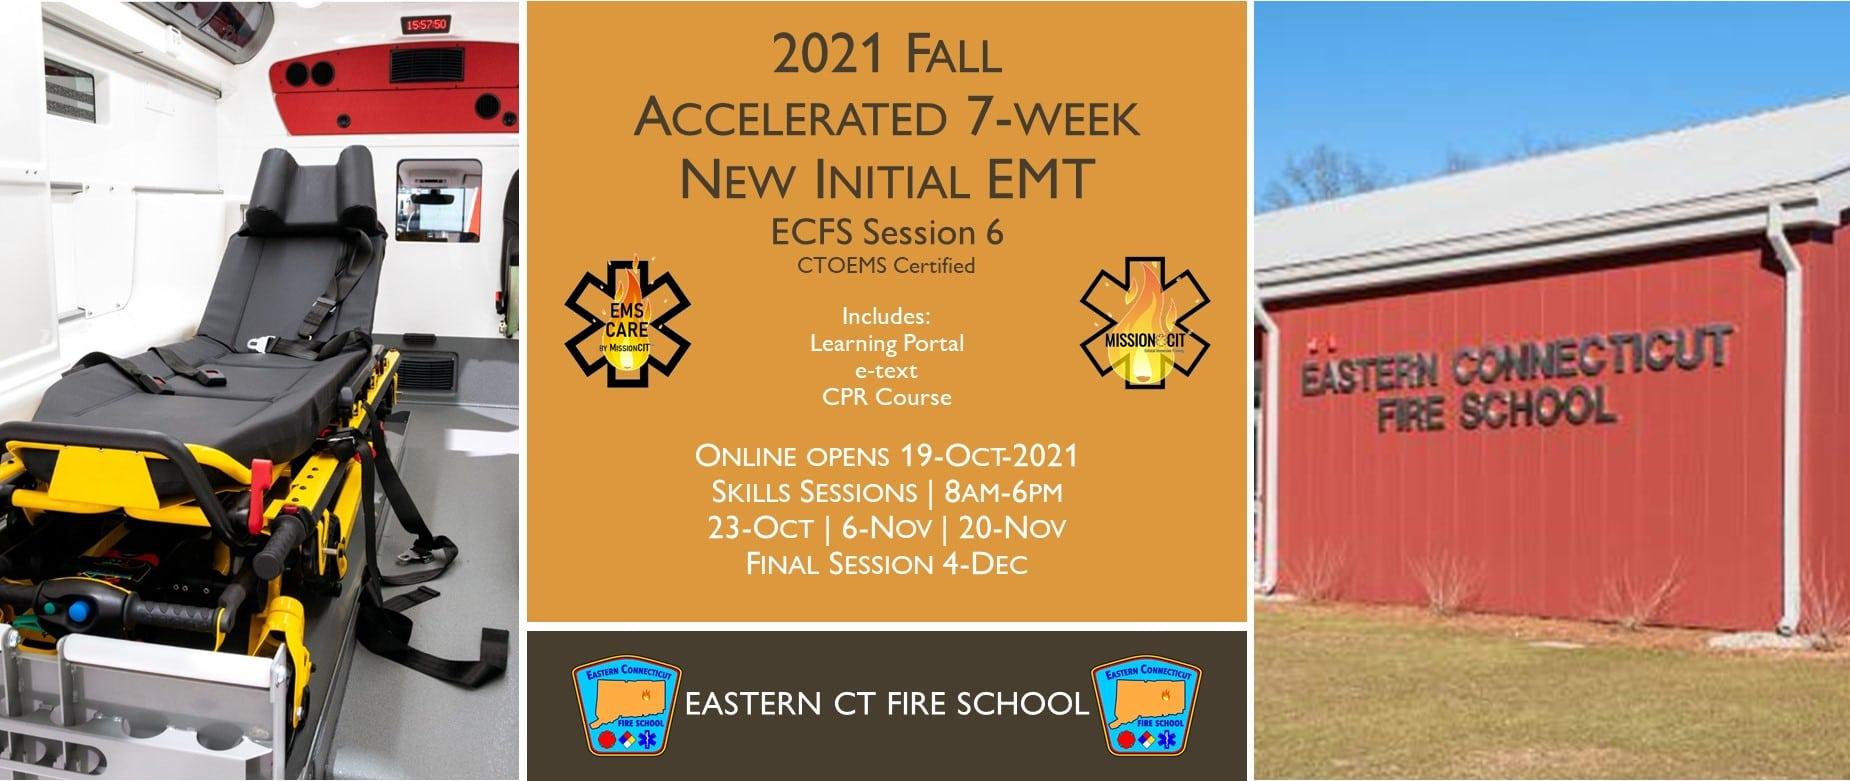 2021 Fall EMT Initial Course   ECFS Session 6   7 week   emt course near me   emt class ct   emt courses in ct   ctoems course